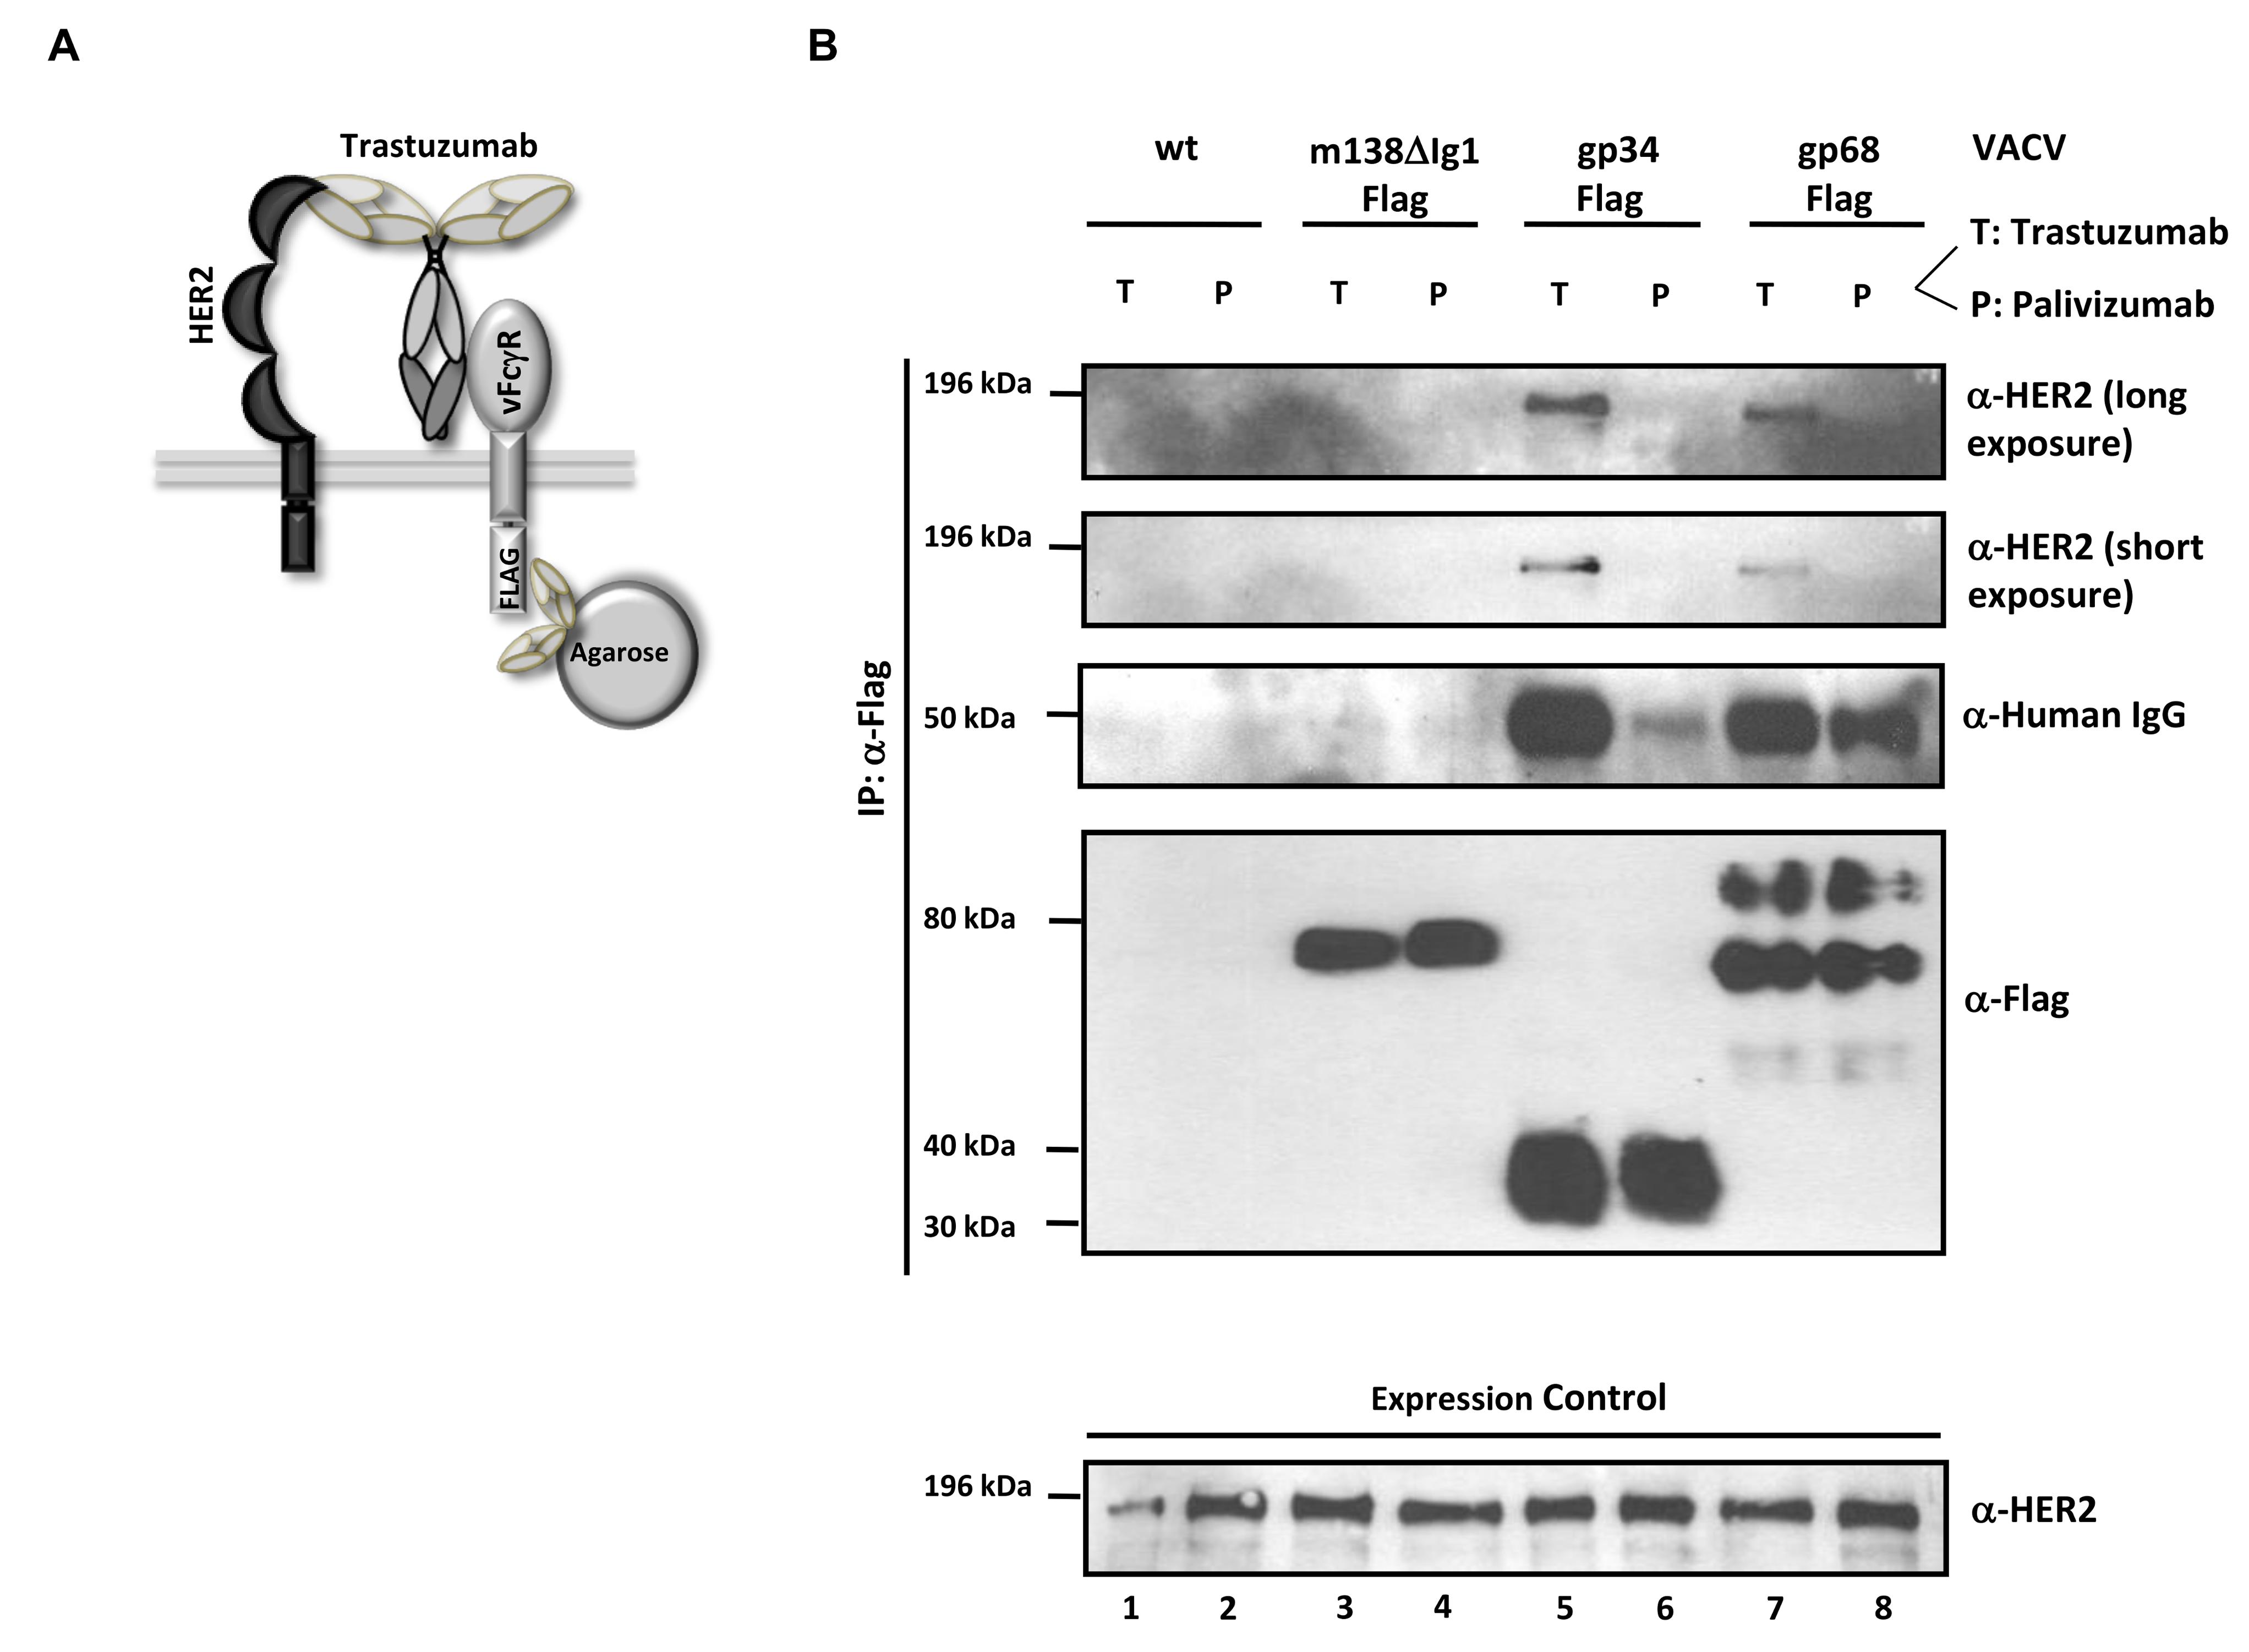 The HCMV vFcγRs gp68 and gp34 bind antigen-IgG complexes.